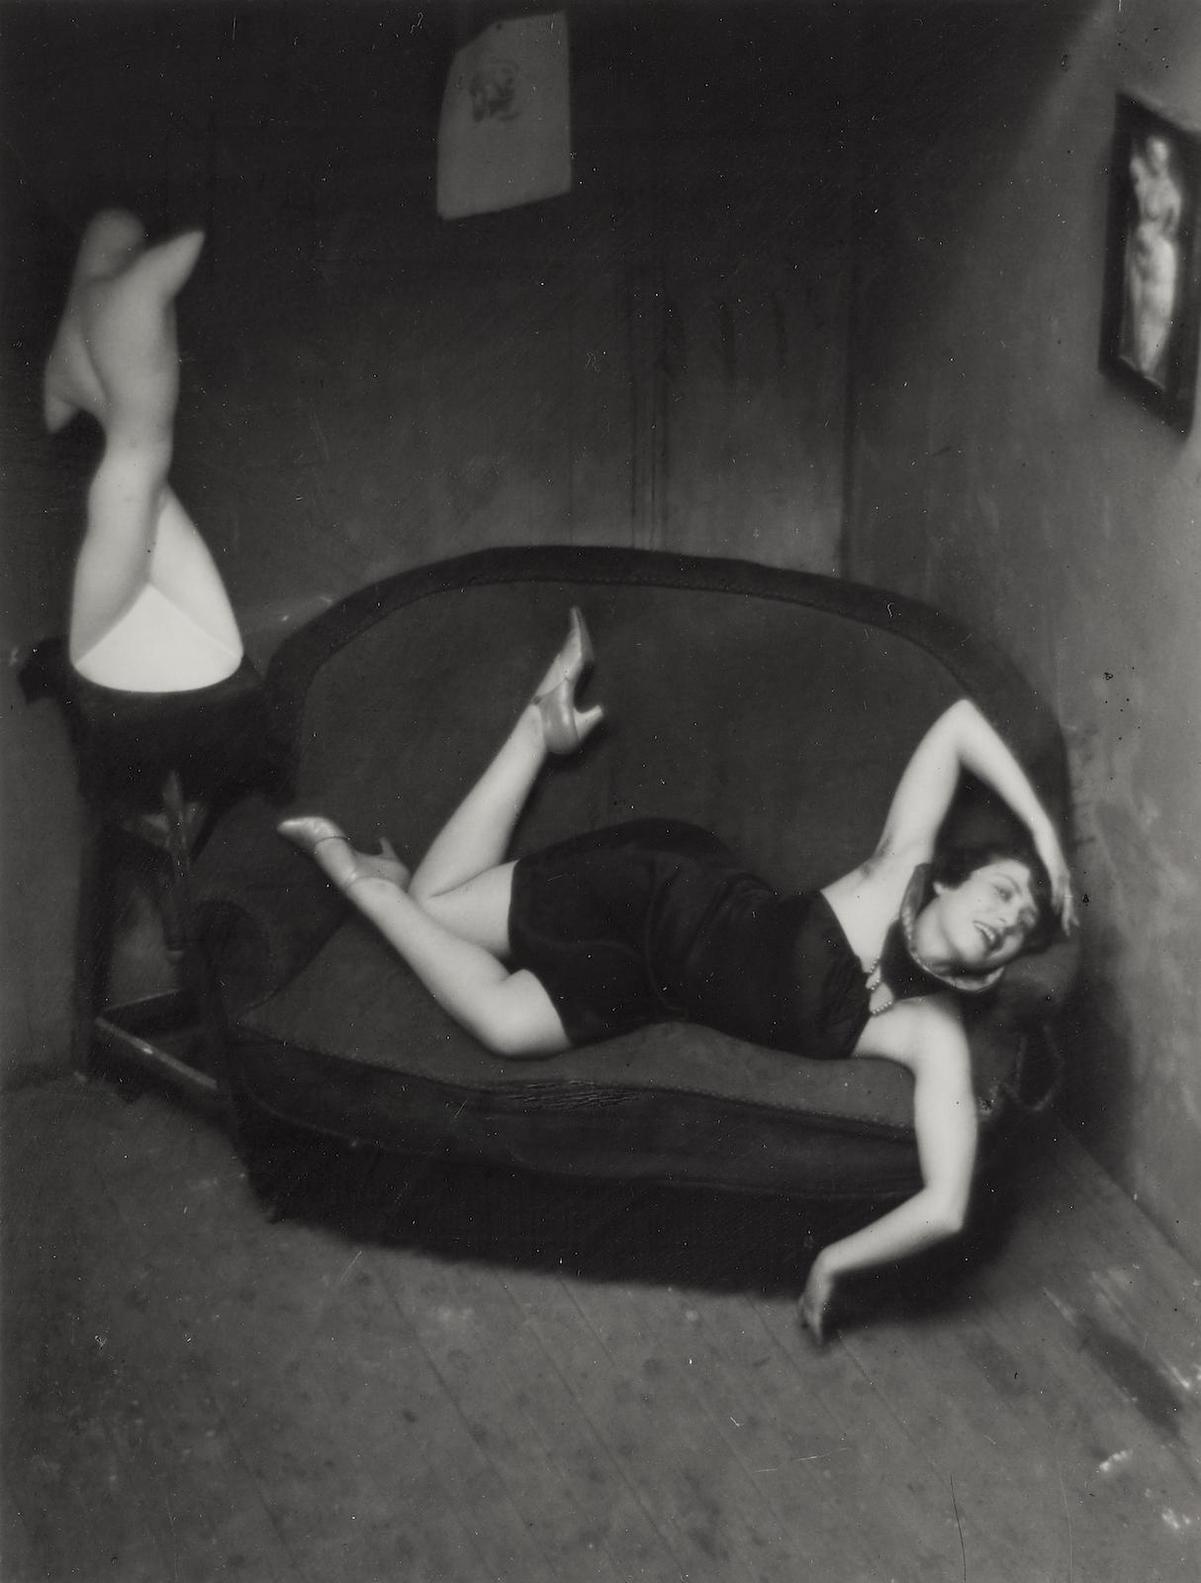 Andre Kertesz-Satiric Dancer, 1926-1926